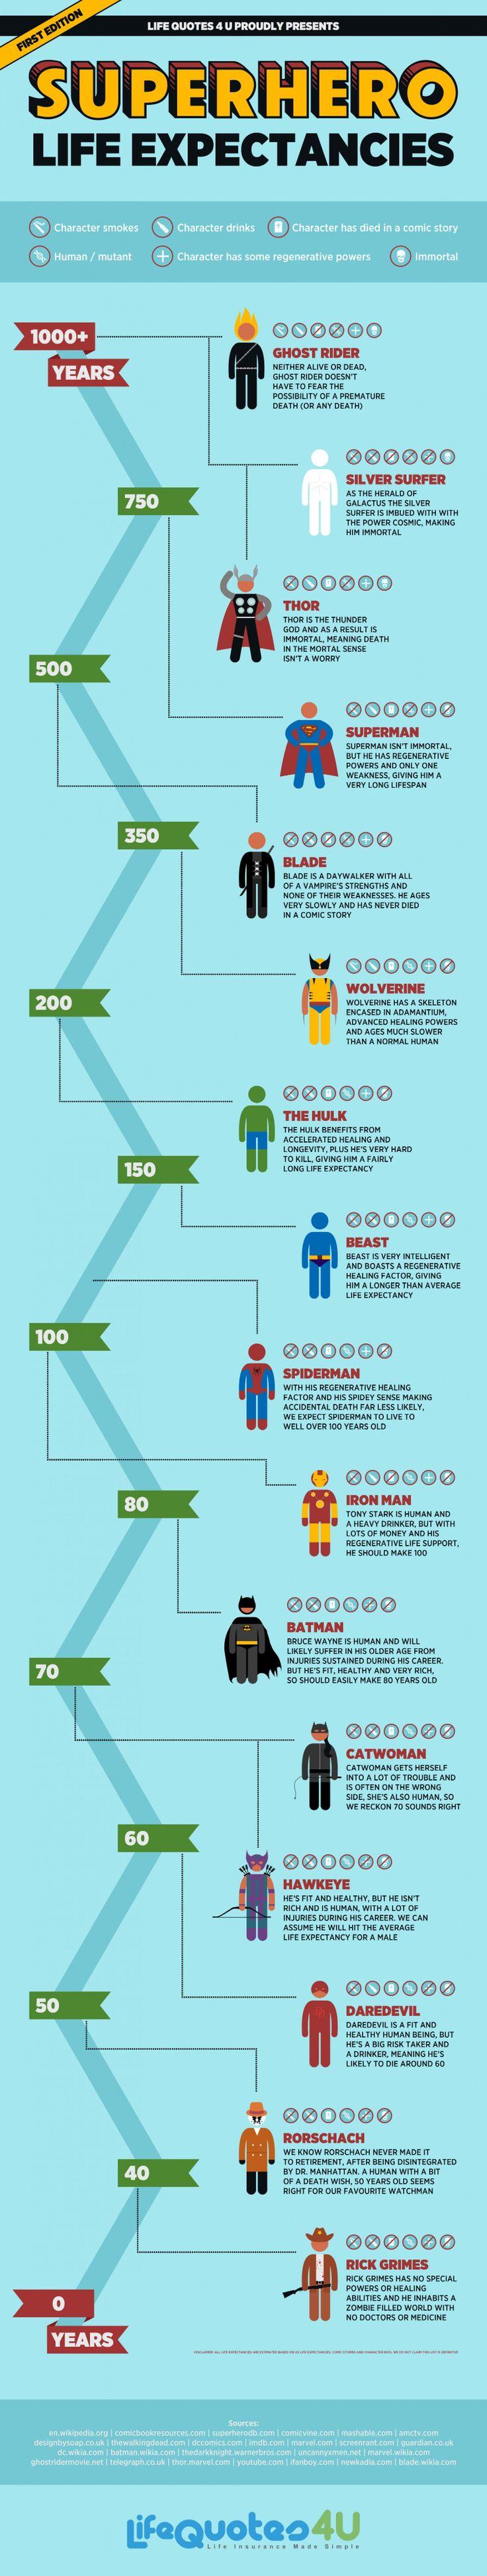 Superhero Life Expectancies Infographic